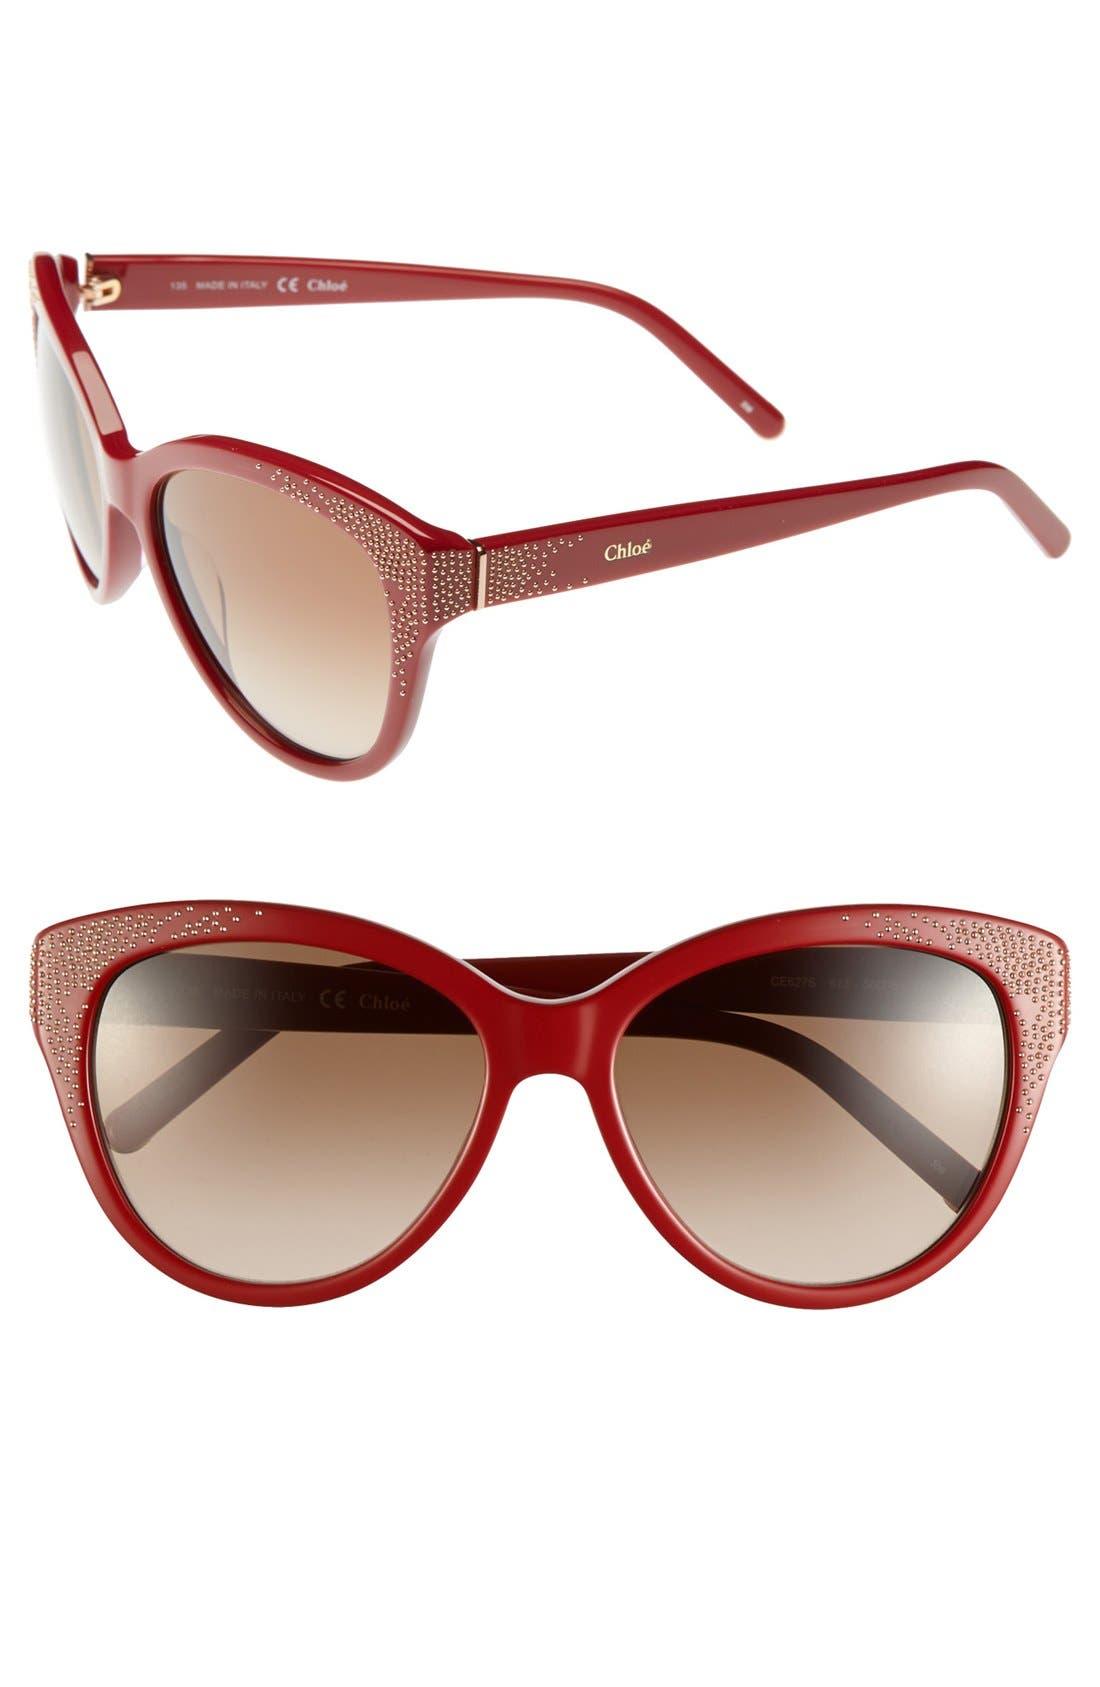 Main Image - Chloé 'Suzanna' 56mm Cat Eye Sunglasses